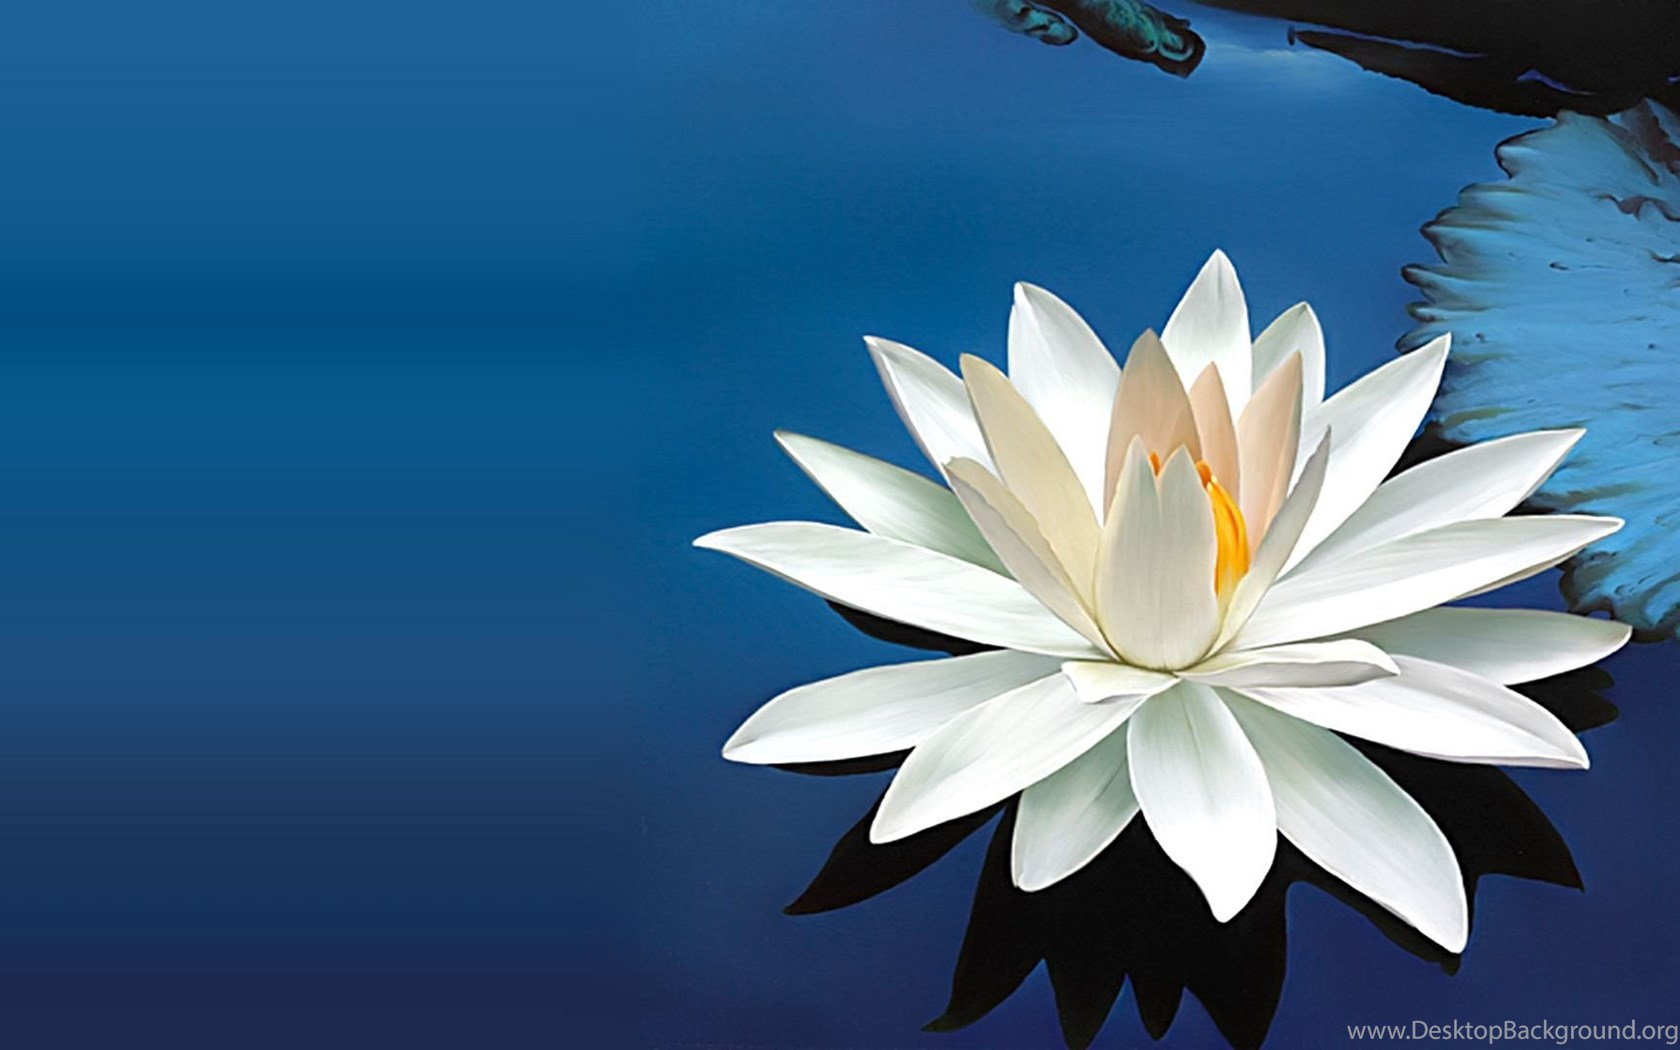 Lotus white lotus flower pics finehdwallpaperr desktop background widescreen izmirmasajfo